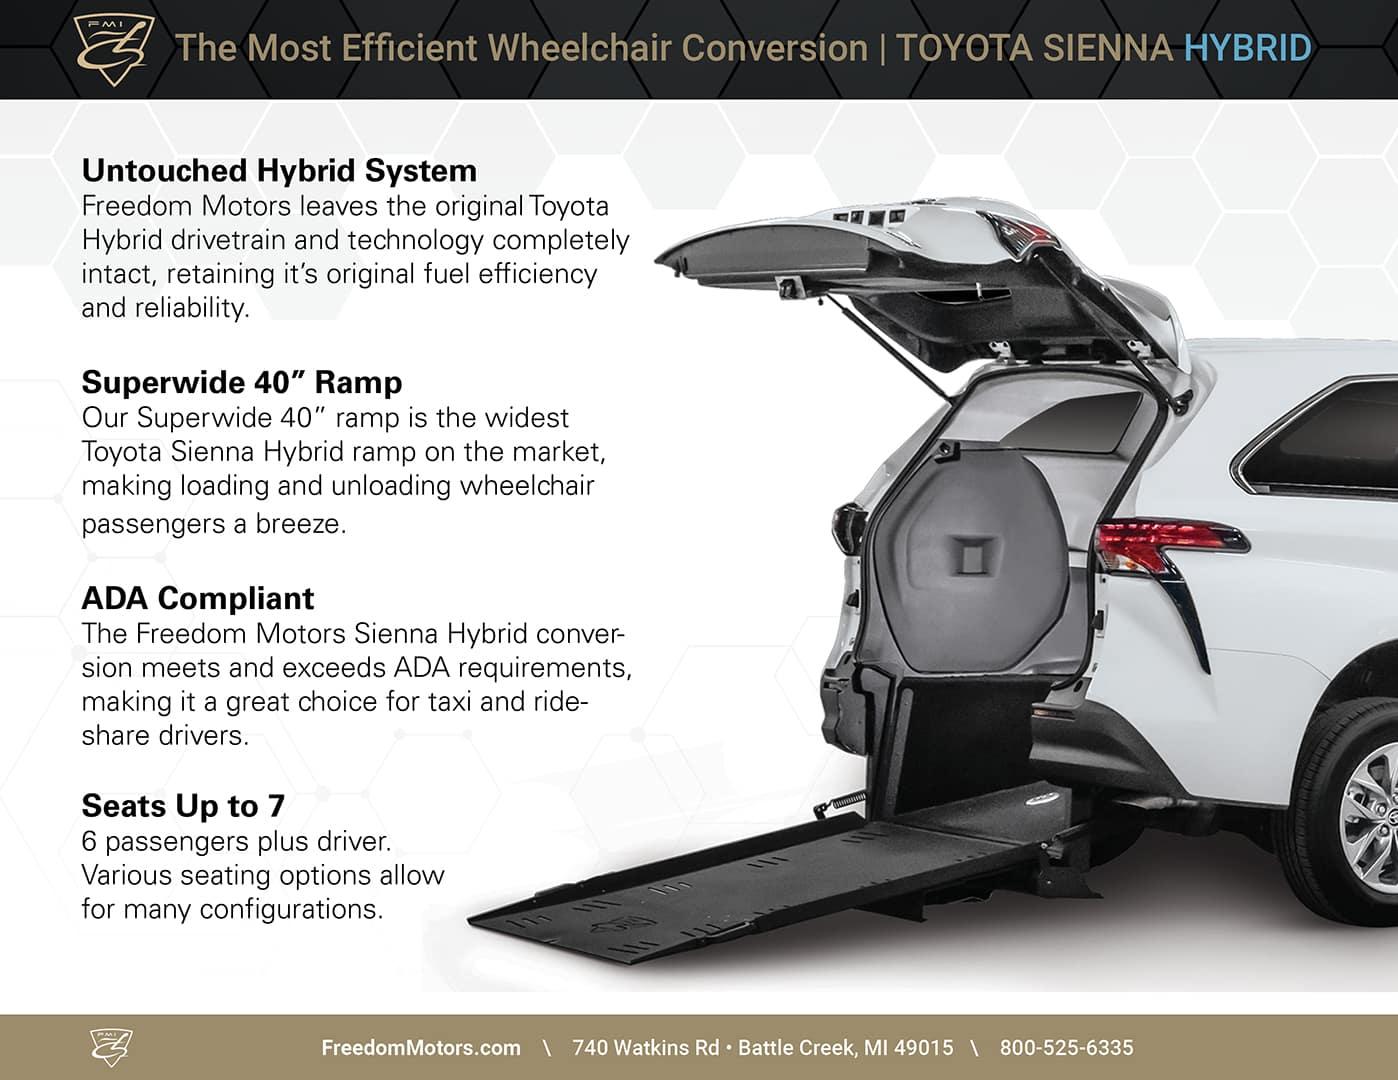 Half Cut Toyota Sienna Hybrid Info Sheet